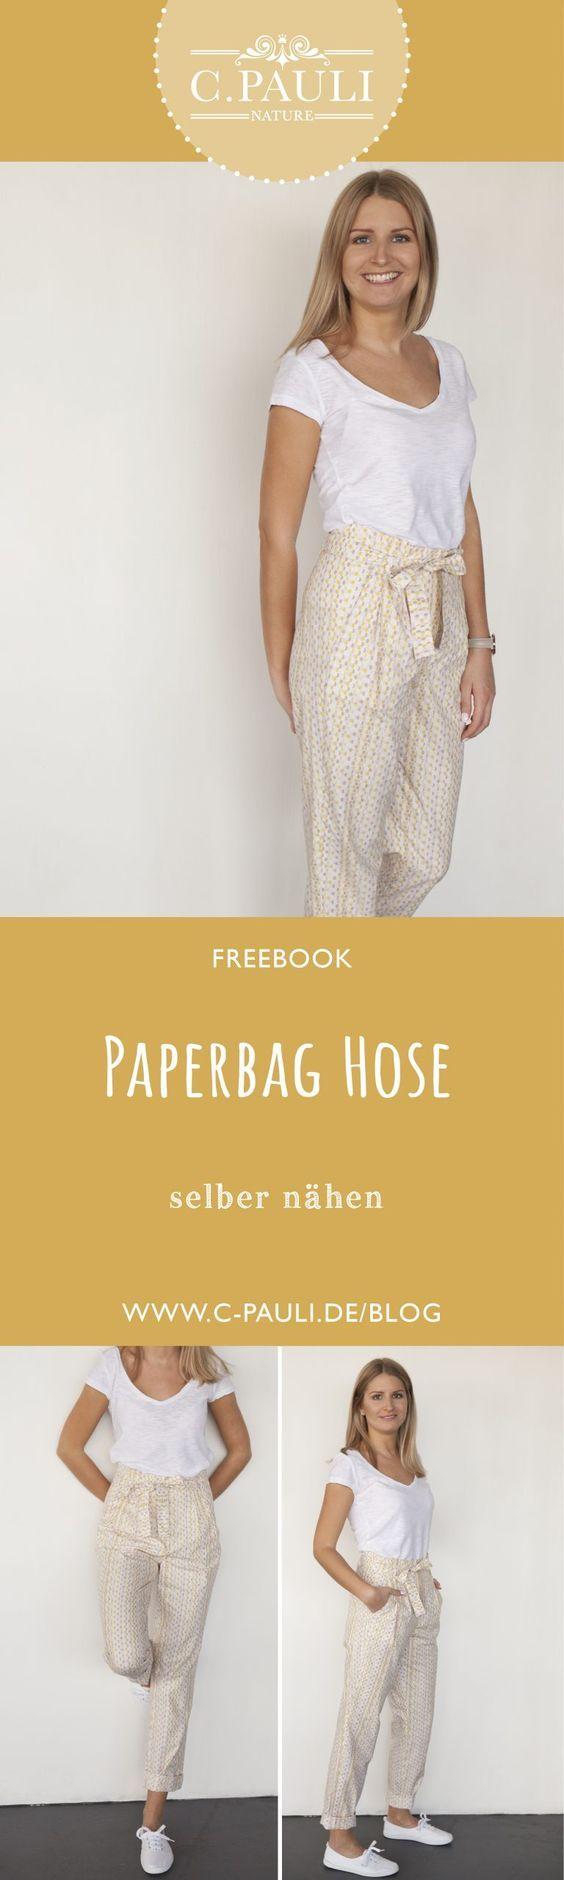 Moderne high waist Paperbag Hose!